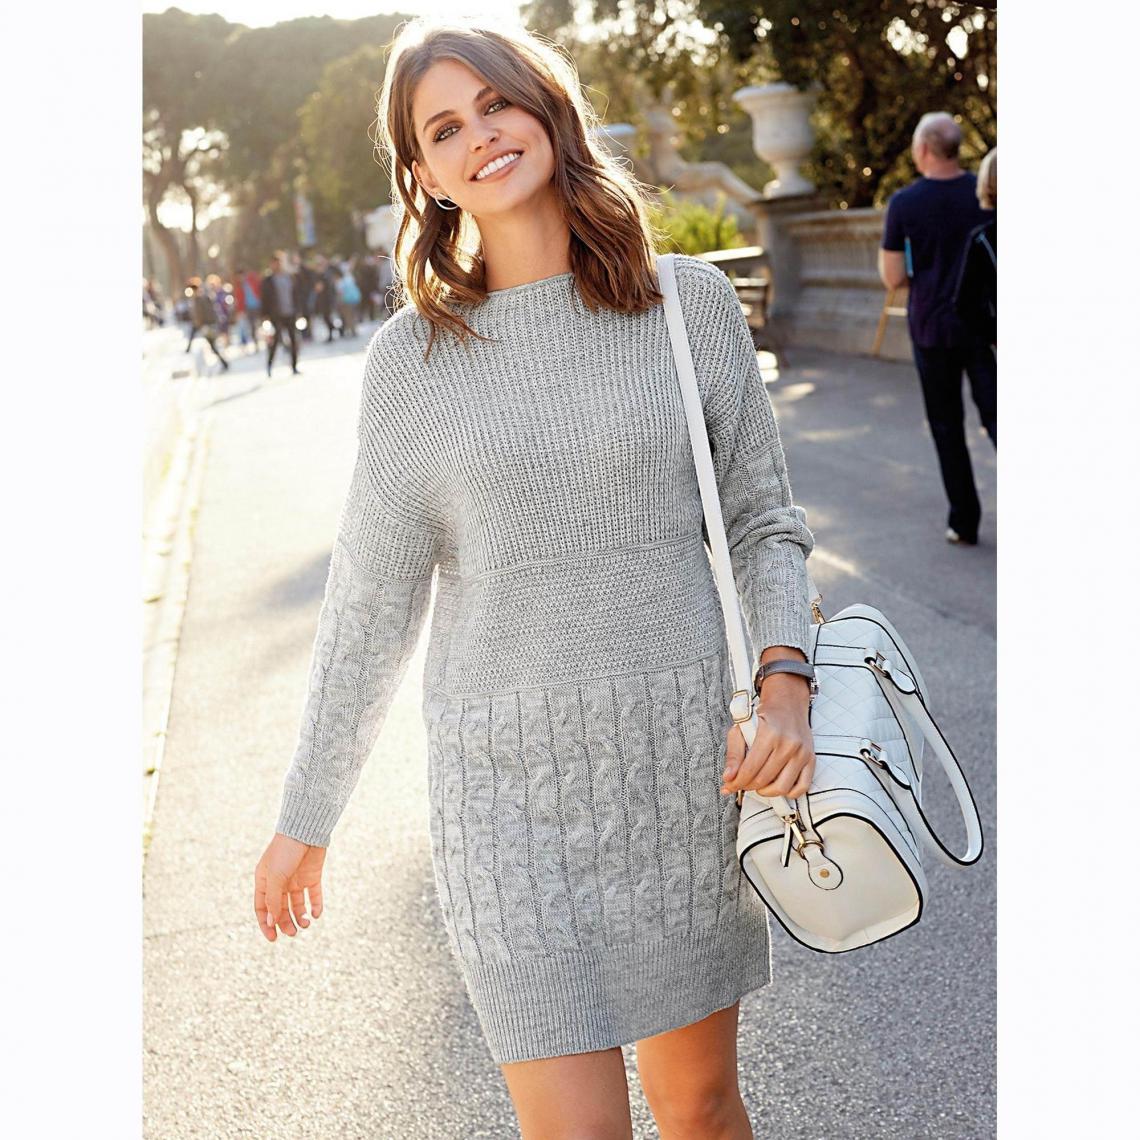 Courte Perle3 Femme Longues Tricot Robe Tresses Manches Gris H29DIWE